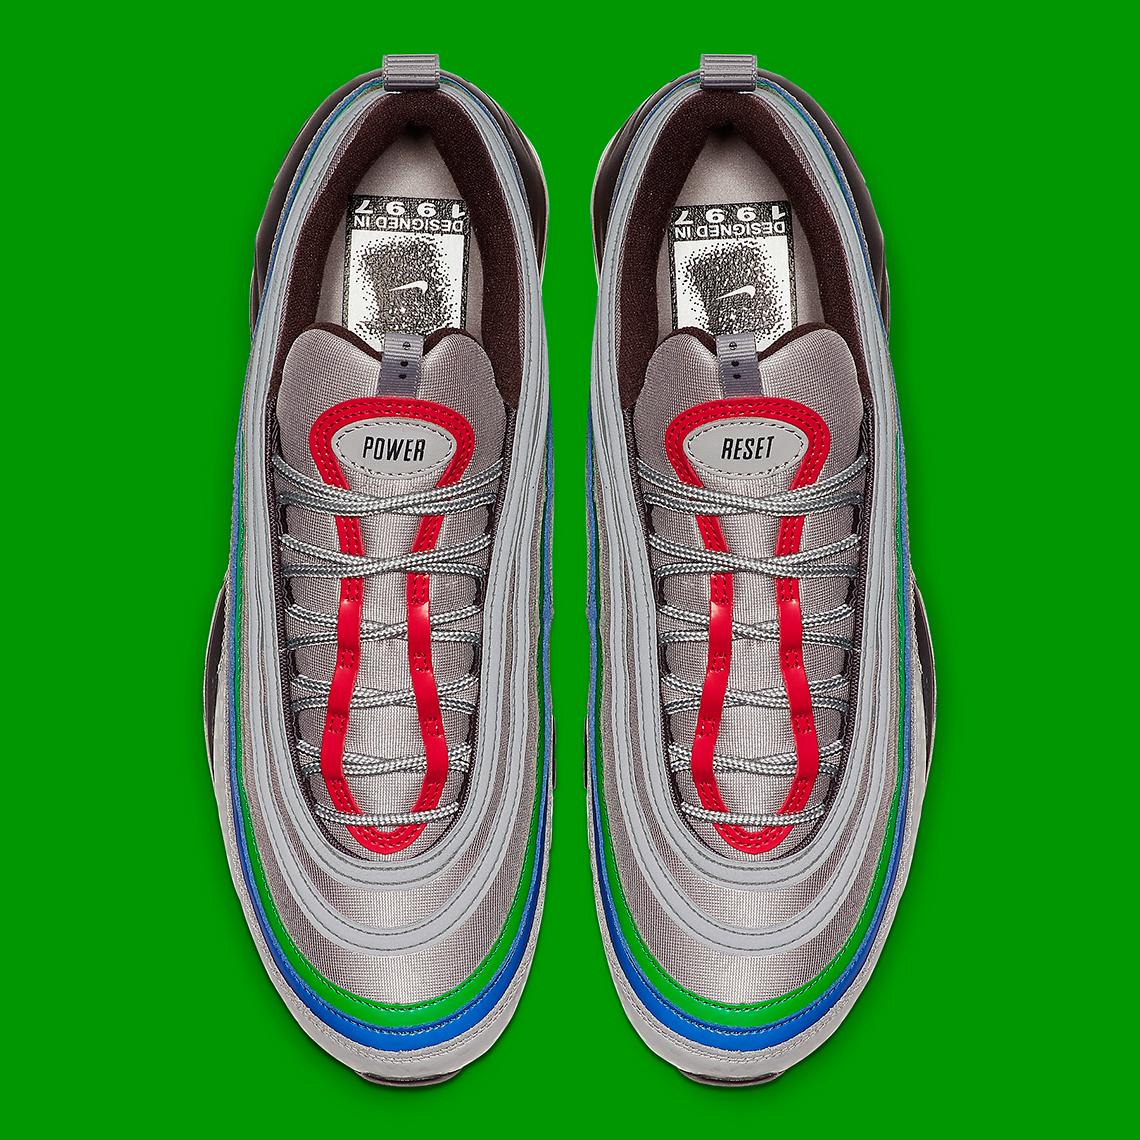 Direkt ab Werk Neu Exklusiv Nike Air Max 97 Damen